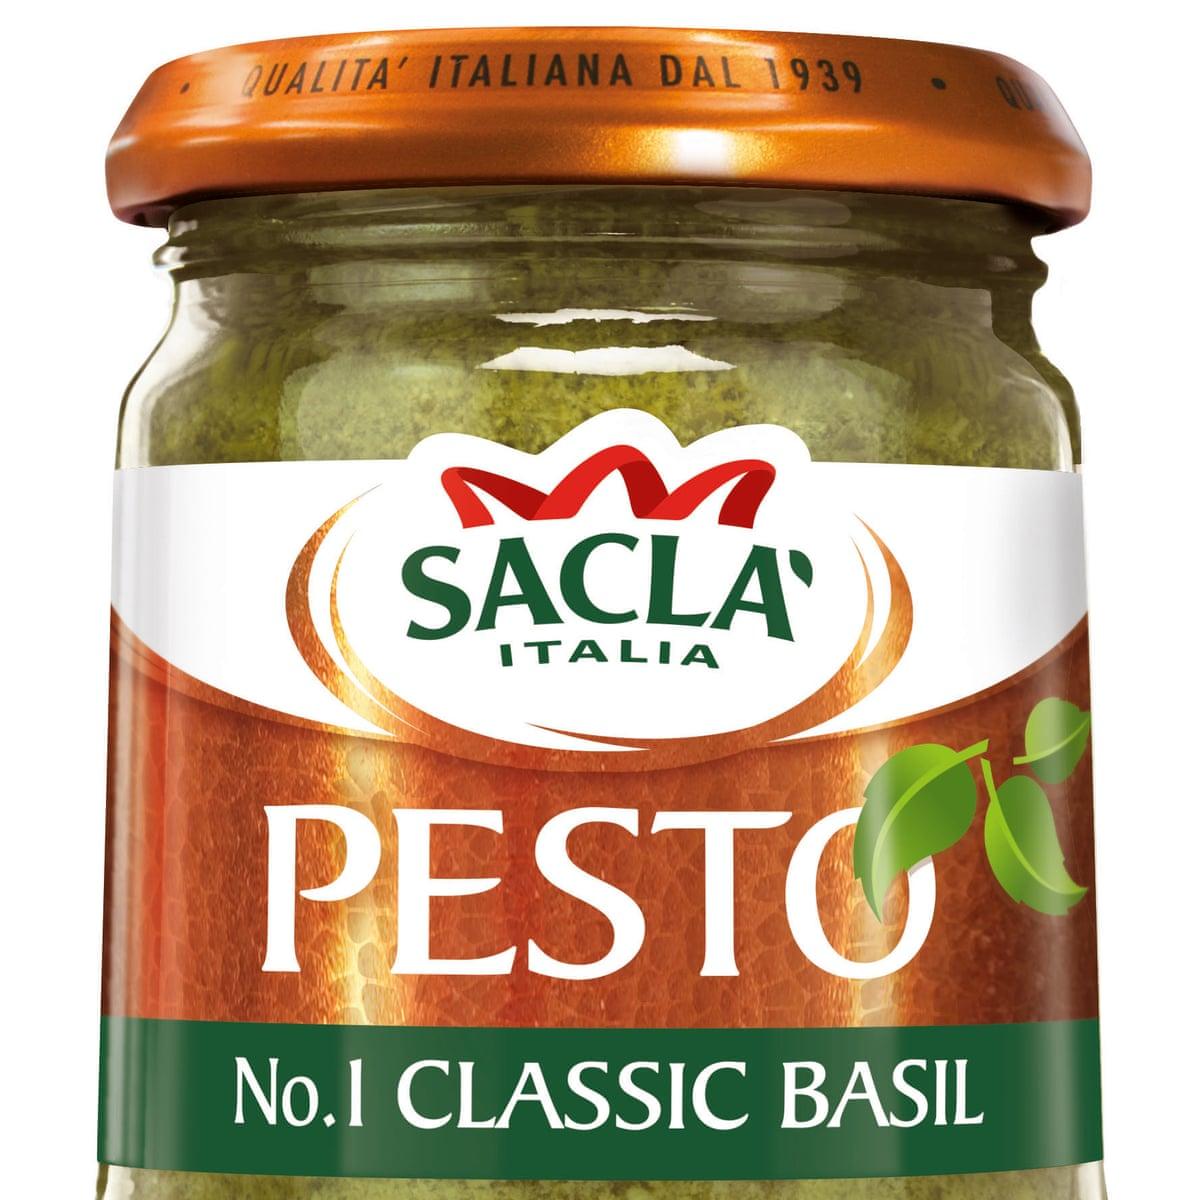 Sacla Recalls Pesto Products Over Peanut Contamination Fears Food The Guardian